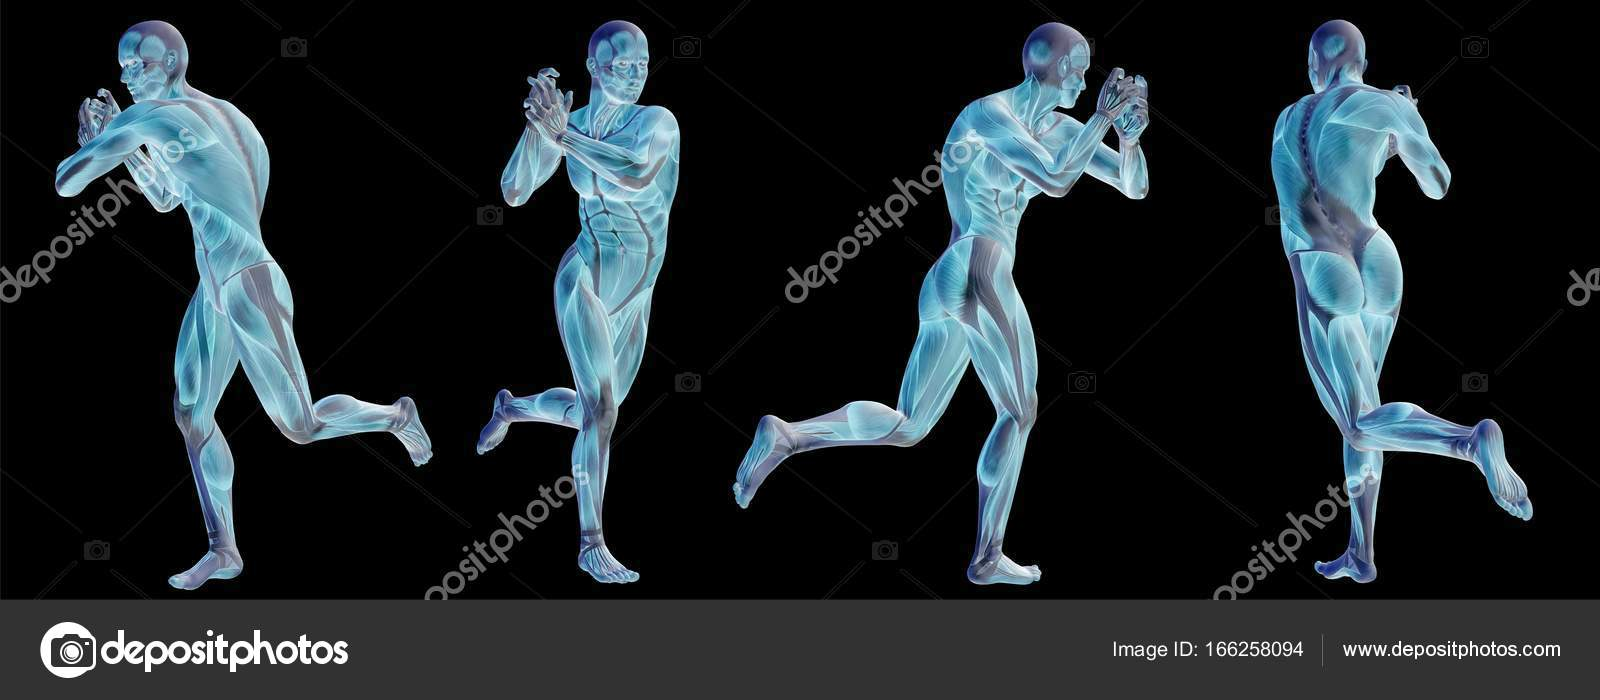 Conceptual 3d Human Anatomy Stock Photo Design36 166258094